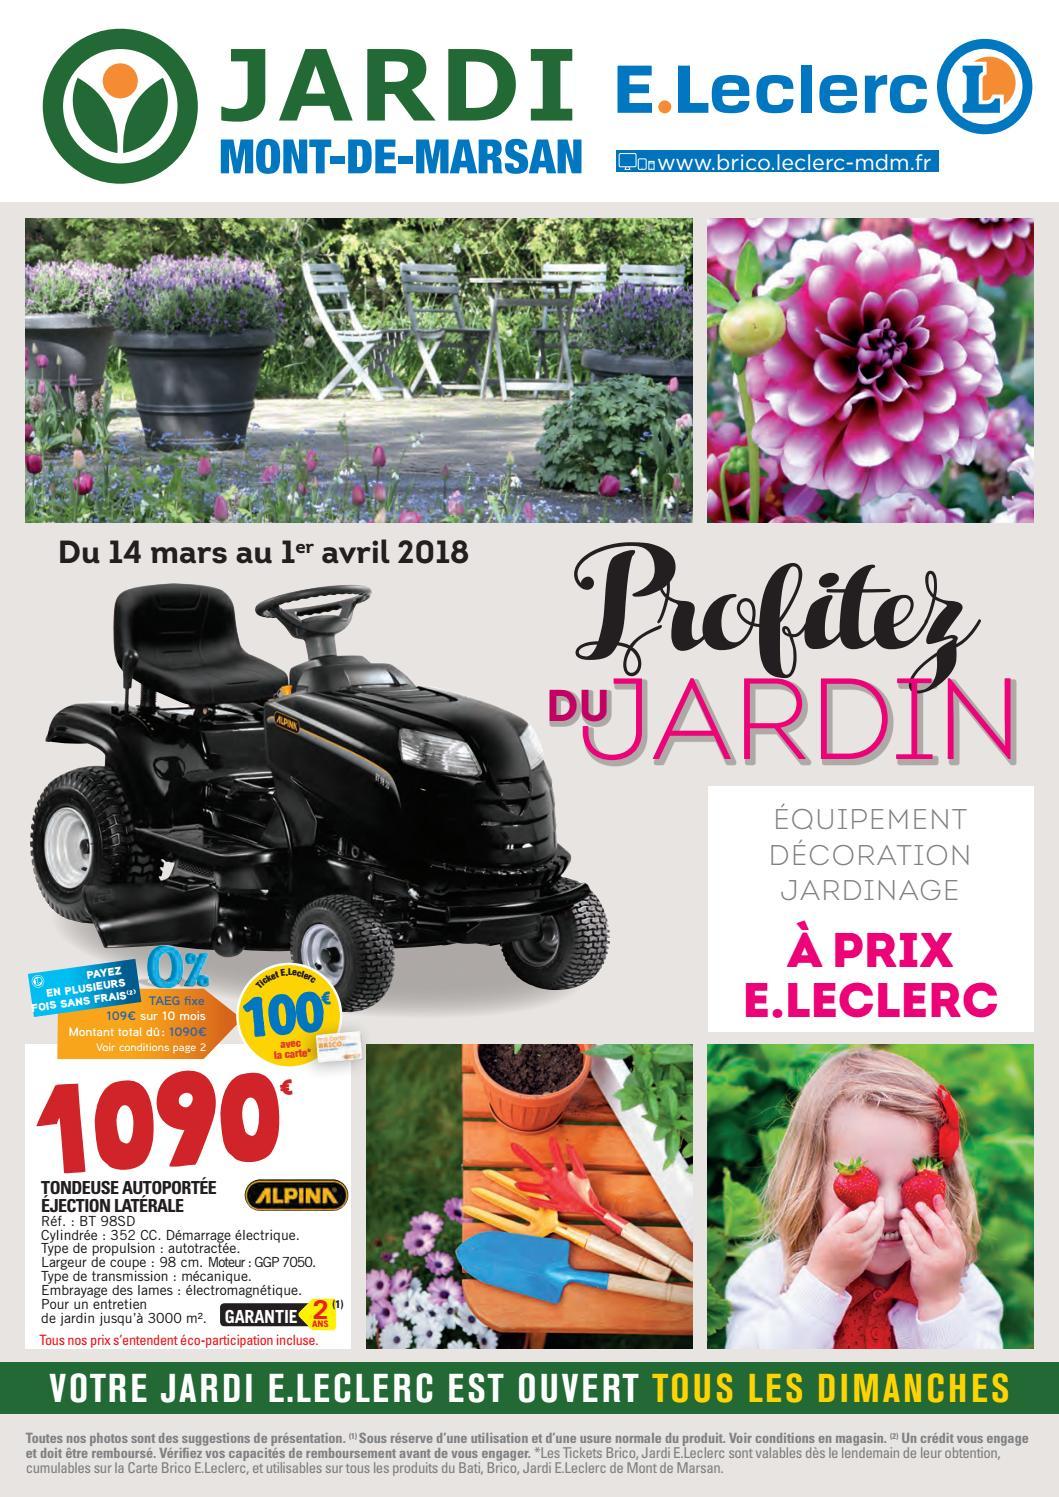 Catalogue Jardin - Jardi E.leclerc By Chou Magazine - Issuu dedans Leclerc Piscine Tubulaire